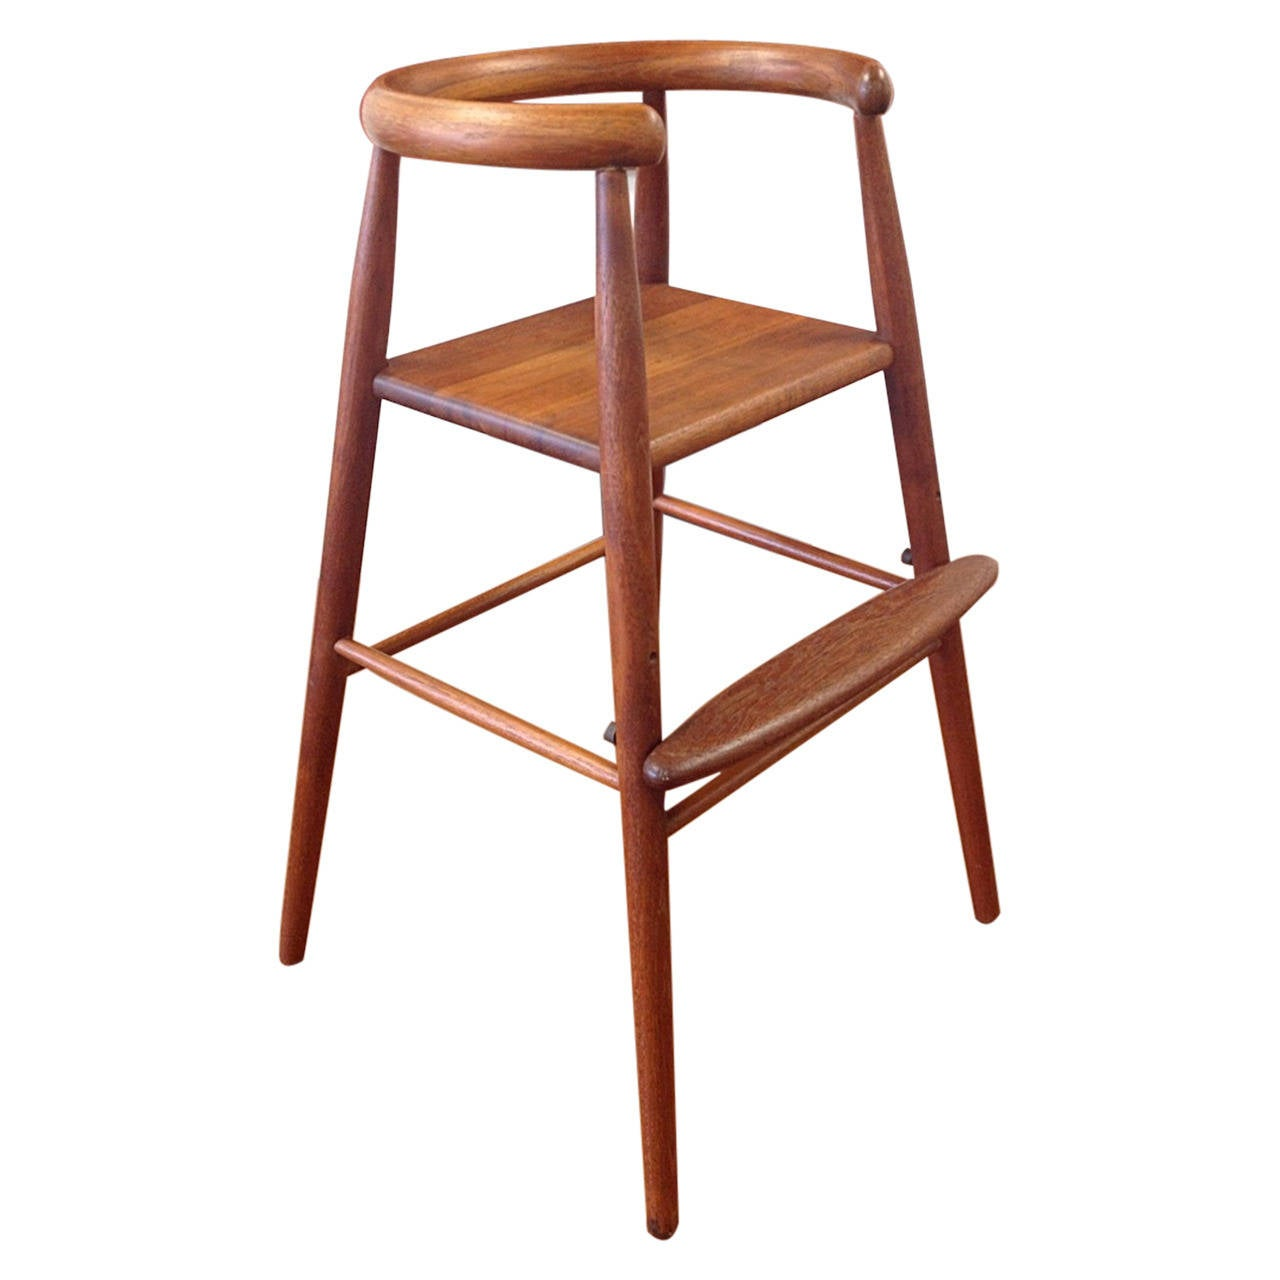 Danish modern teak child s high chair by kolds savvaerk at 1stdibs